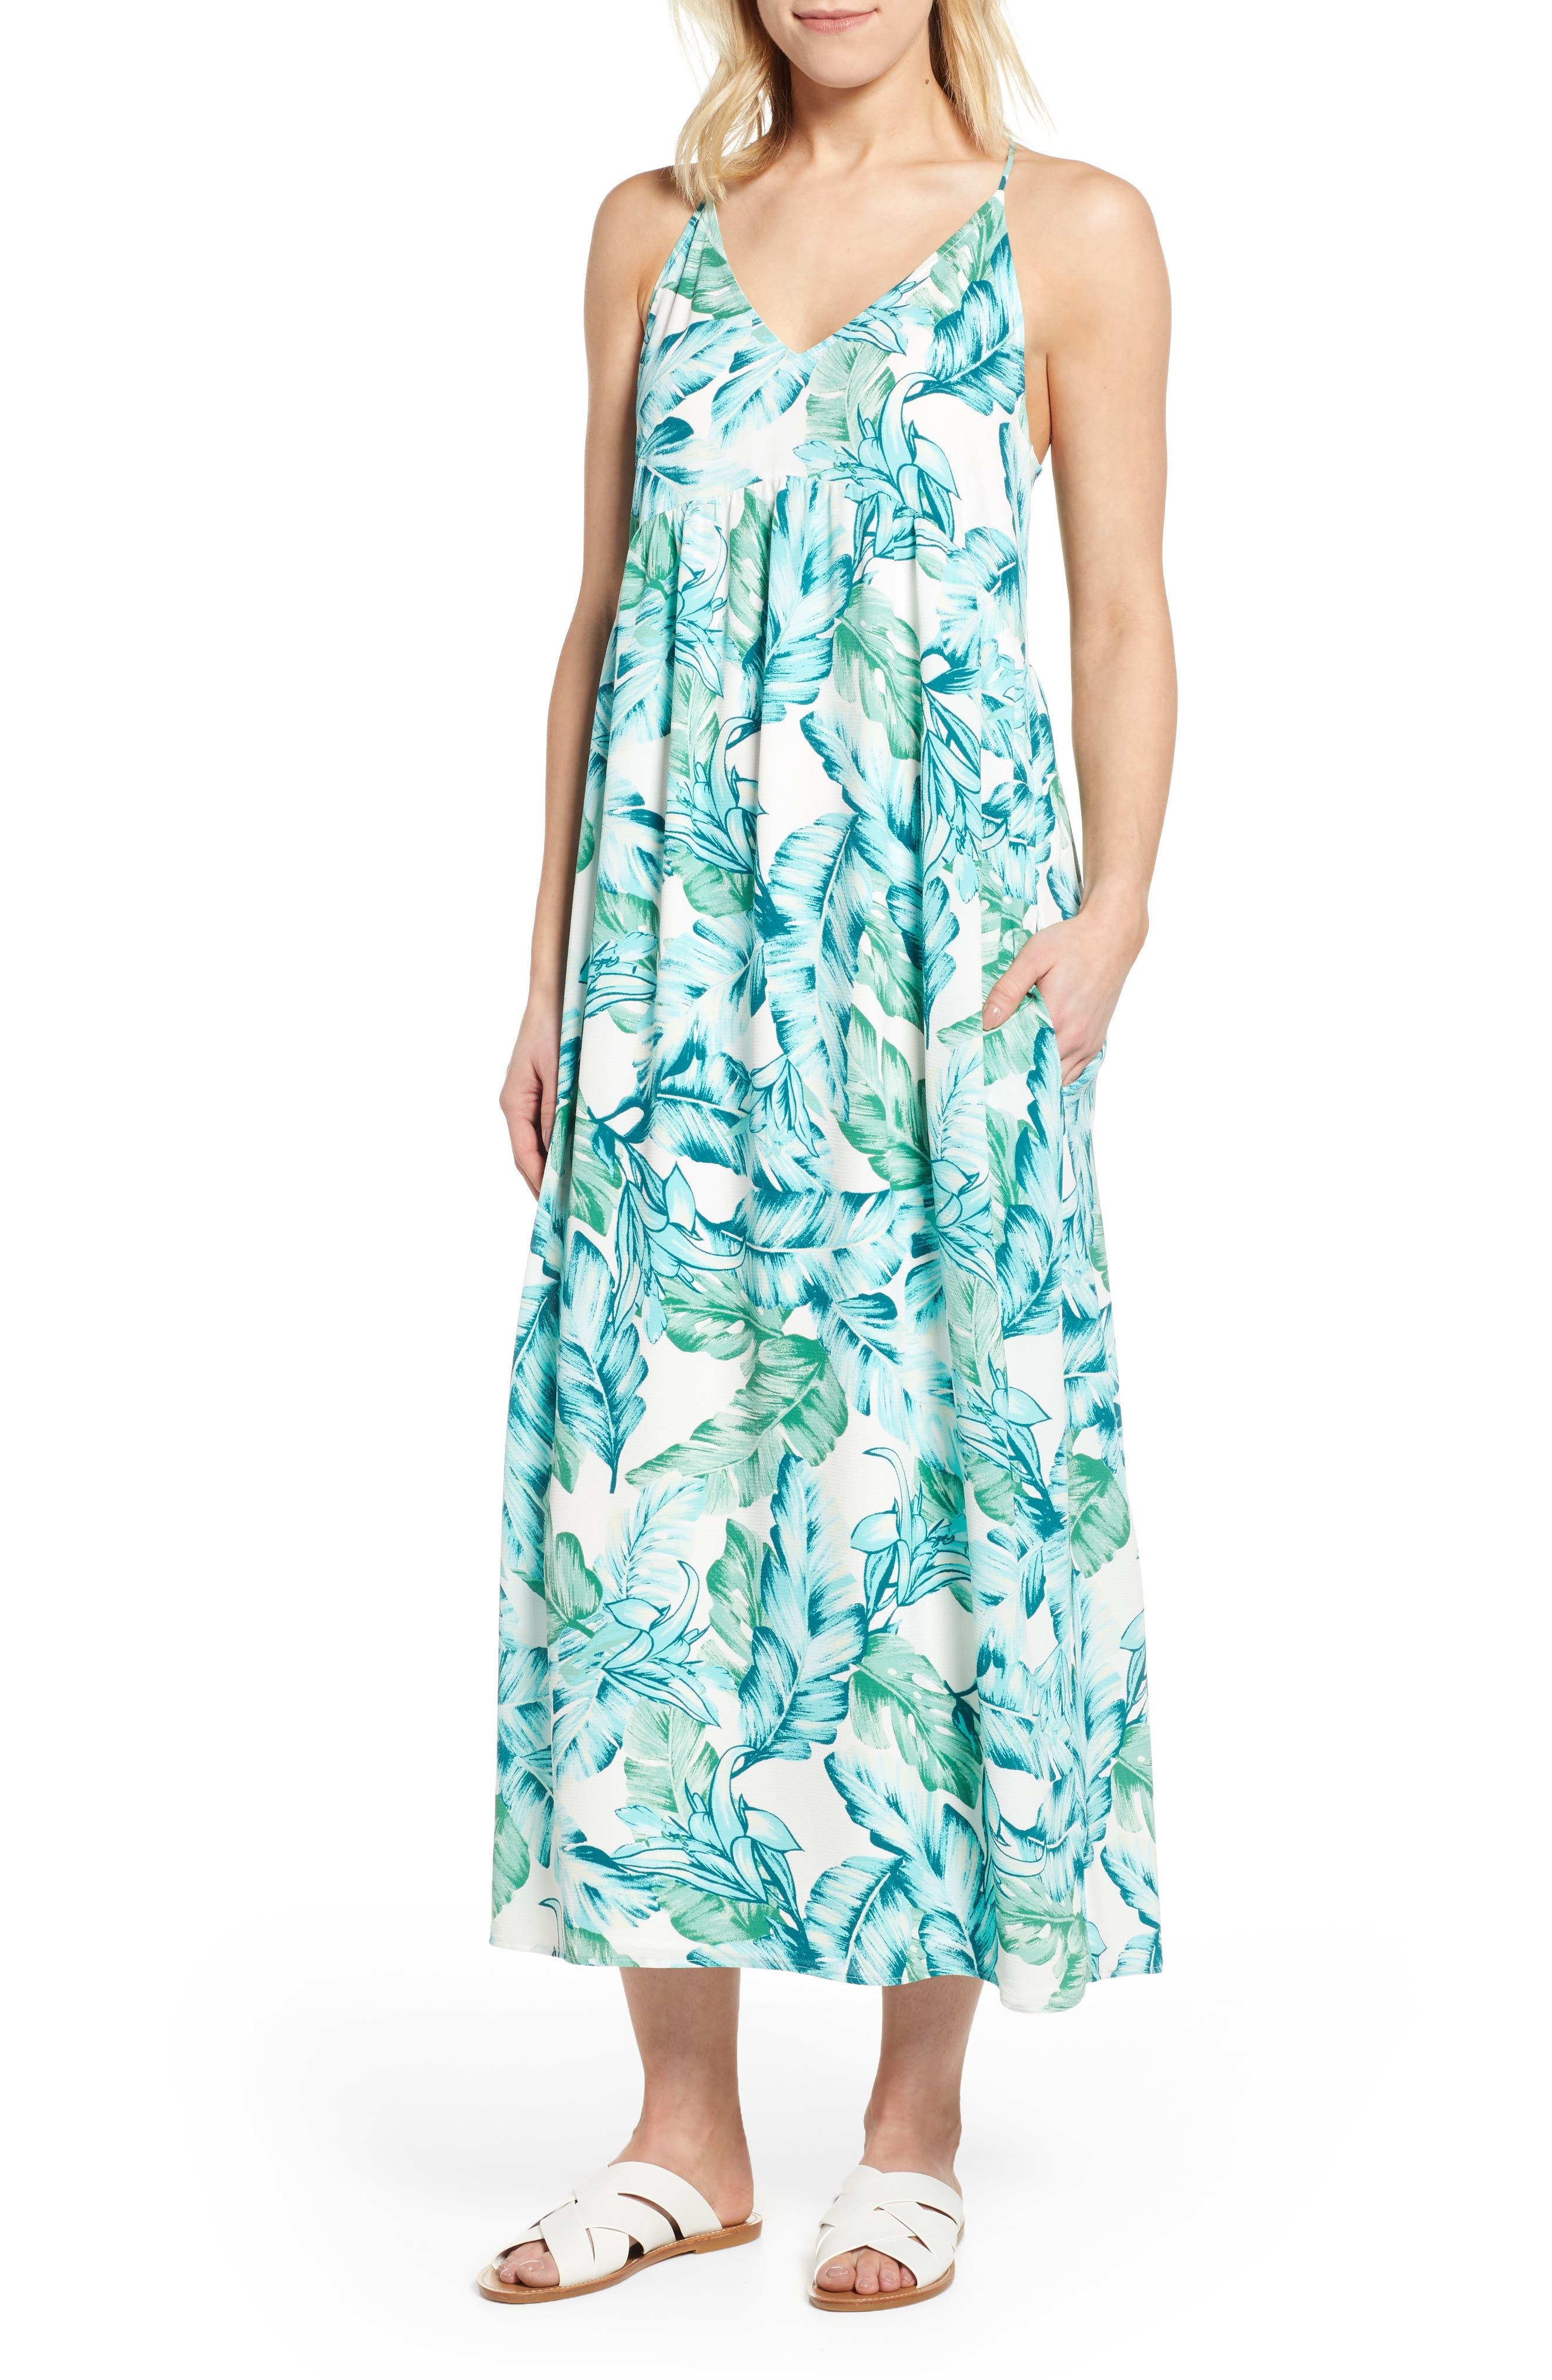 6d411bcf6d43 Buy gibson dresses for women - Best women's gibson dresses shop ...